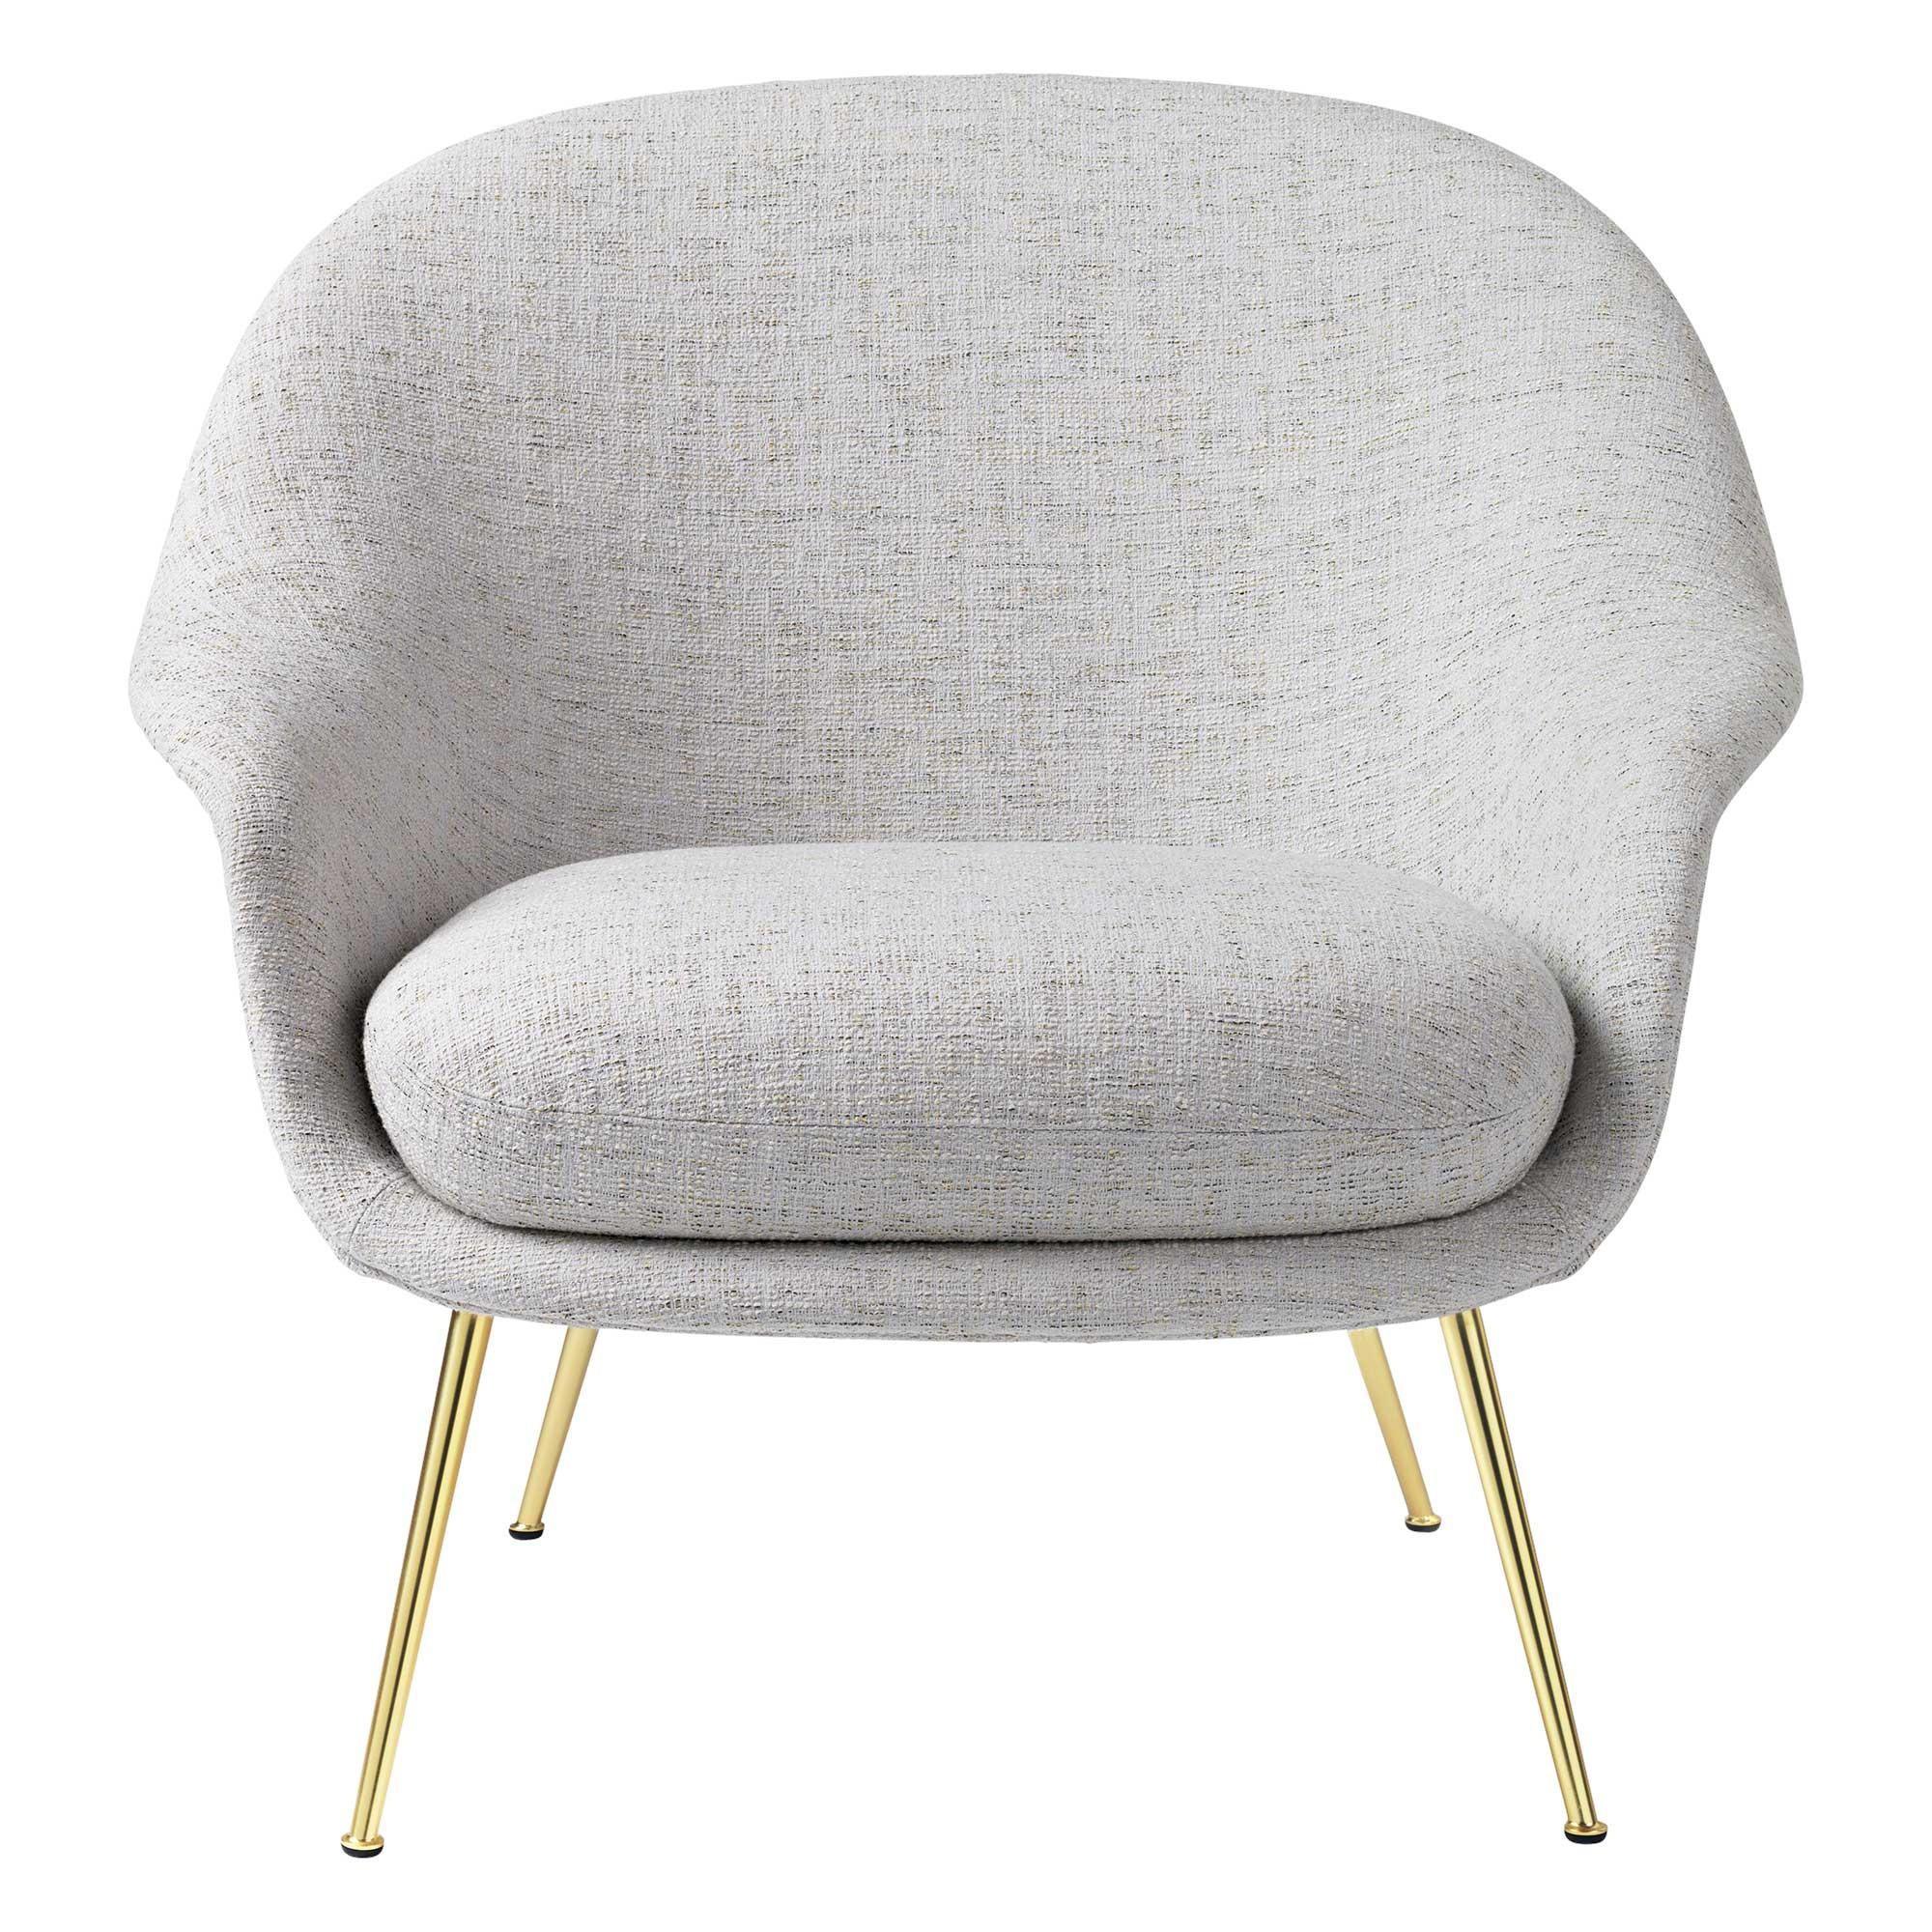 Tremendous Bat Lounge Chair Low Back Brass Base Ibusinesslaw Wood Chair Design Ideas Ibusinesslaworg